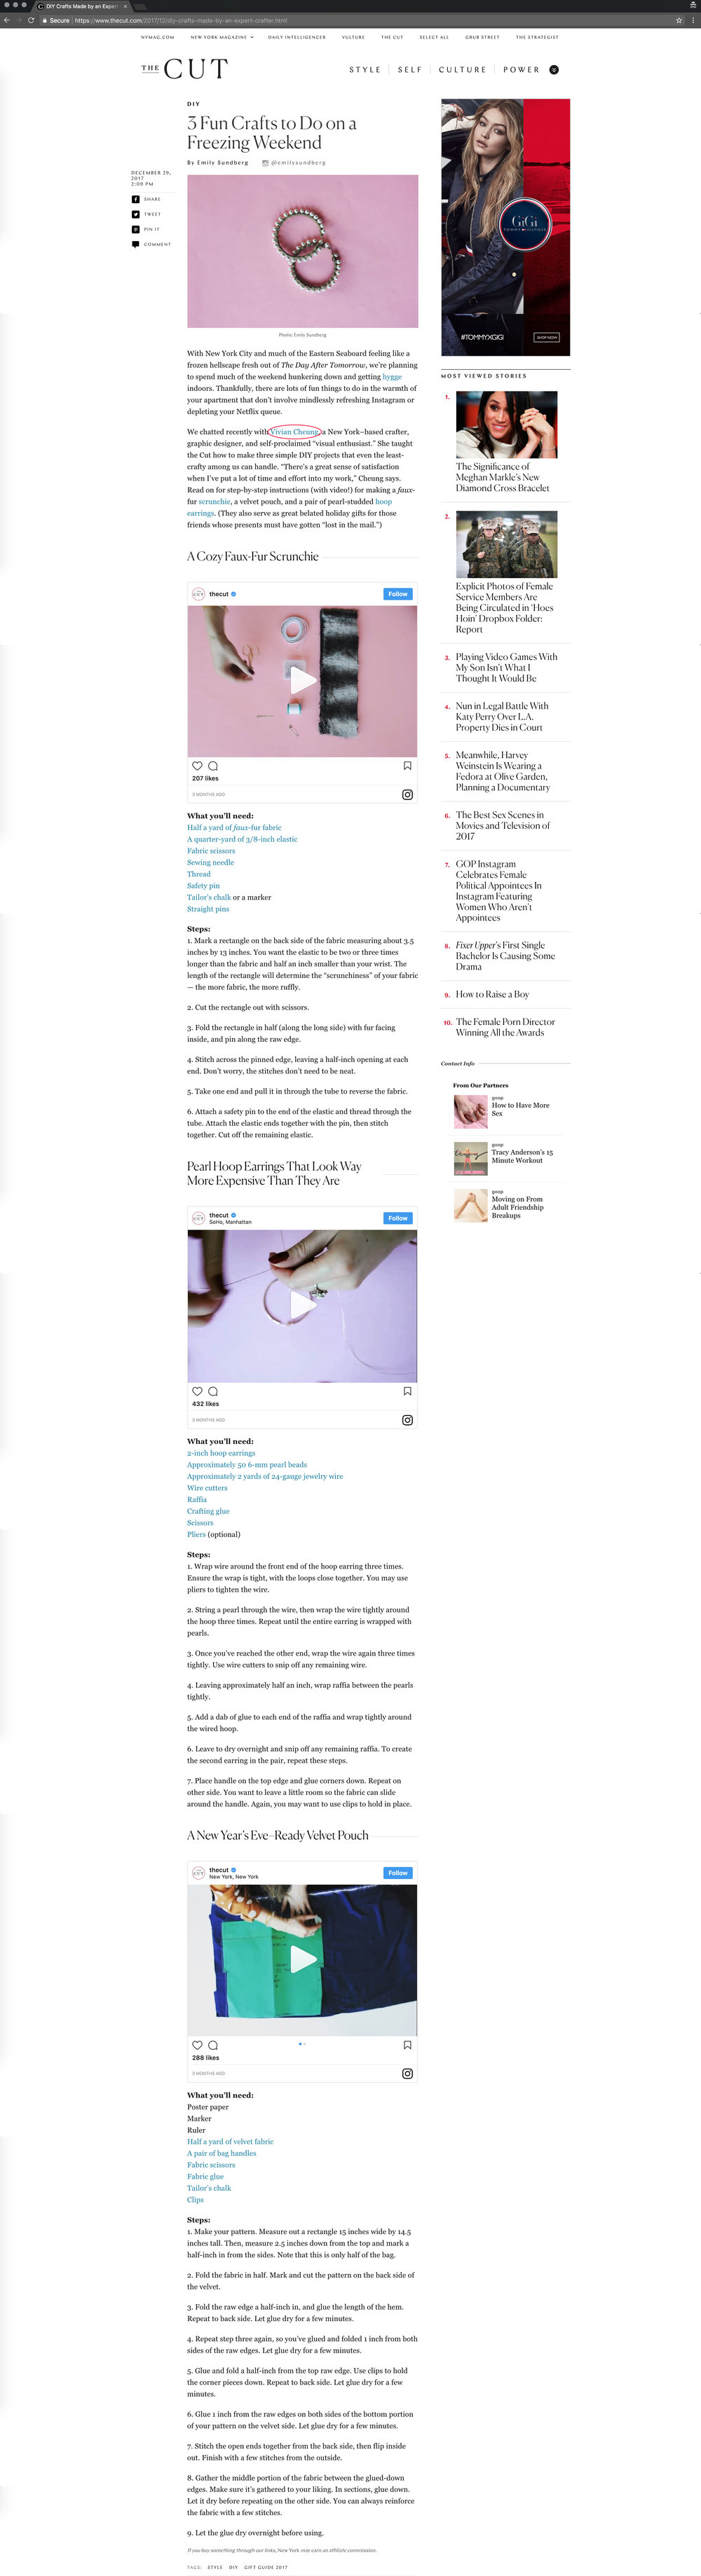 2_Article-TheCut.jpg